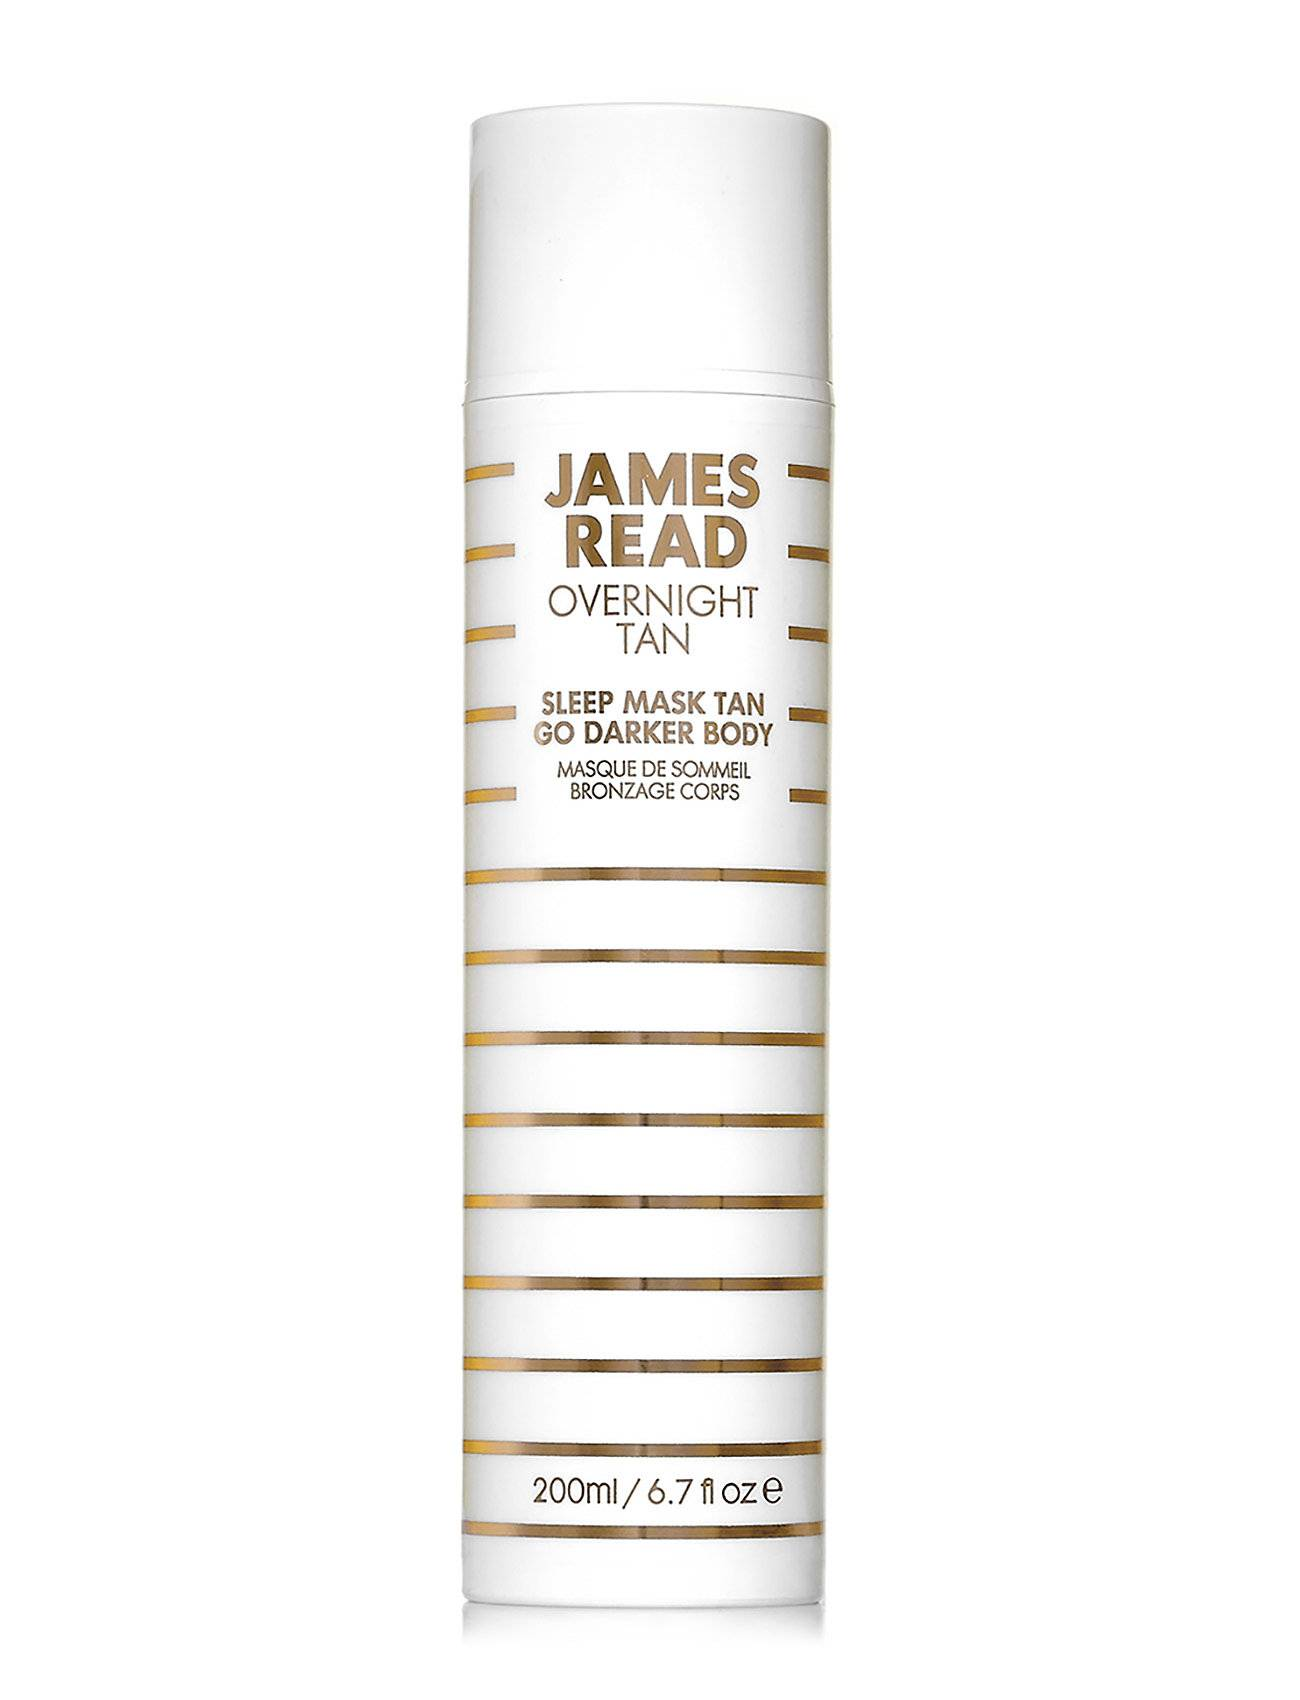 James Read Sleep Mask Go Darker Body Beauty WOMEN Skin Care Sun Products Self Tanners Nude James Read